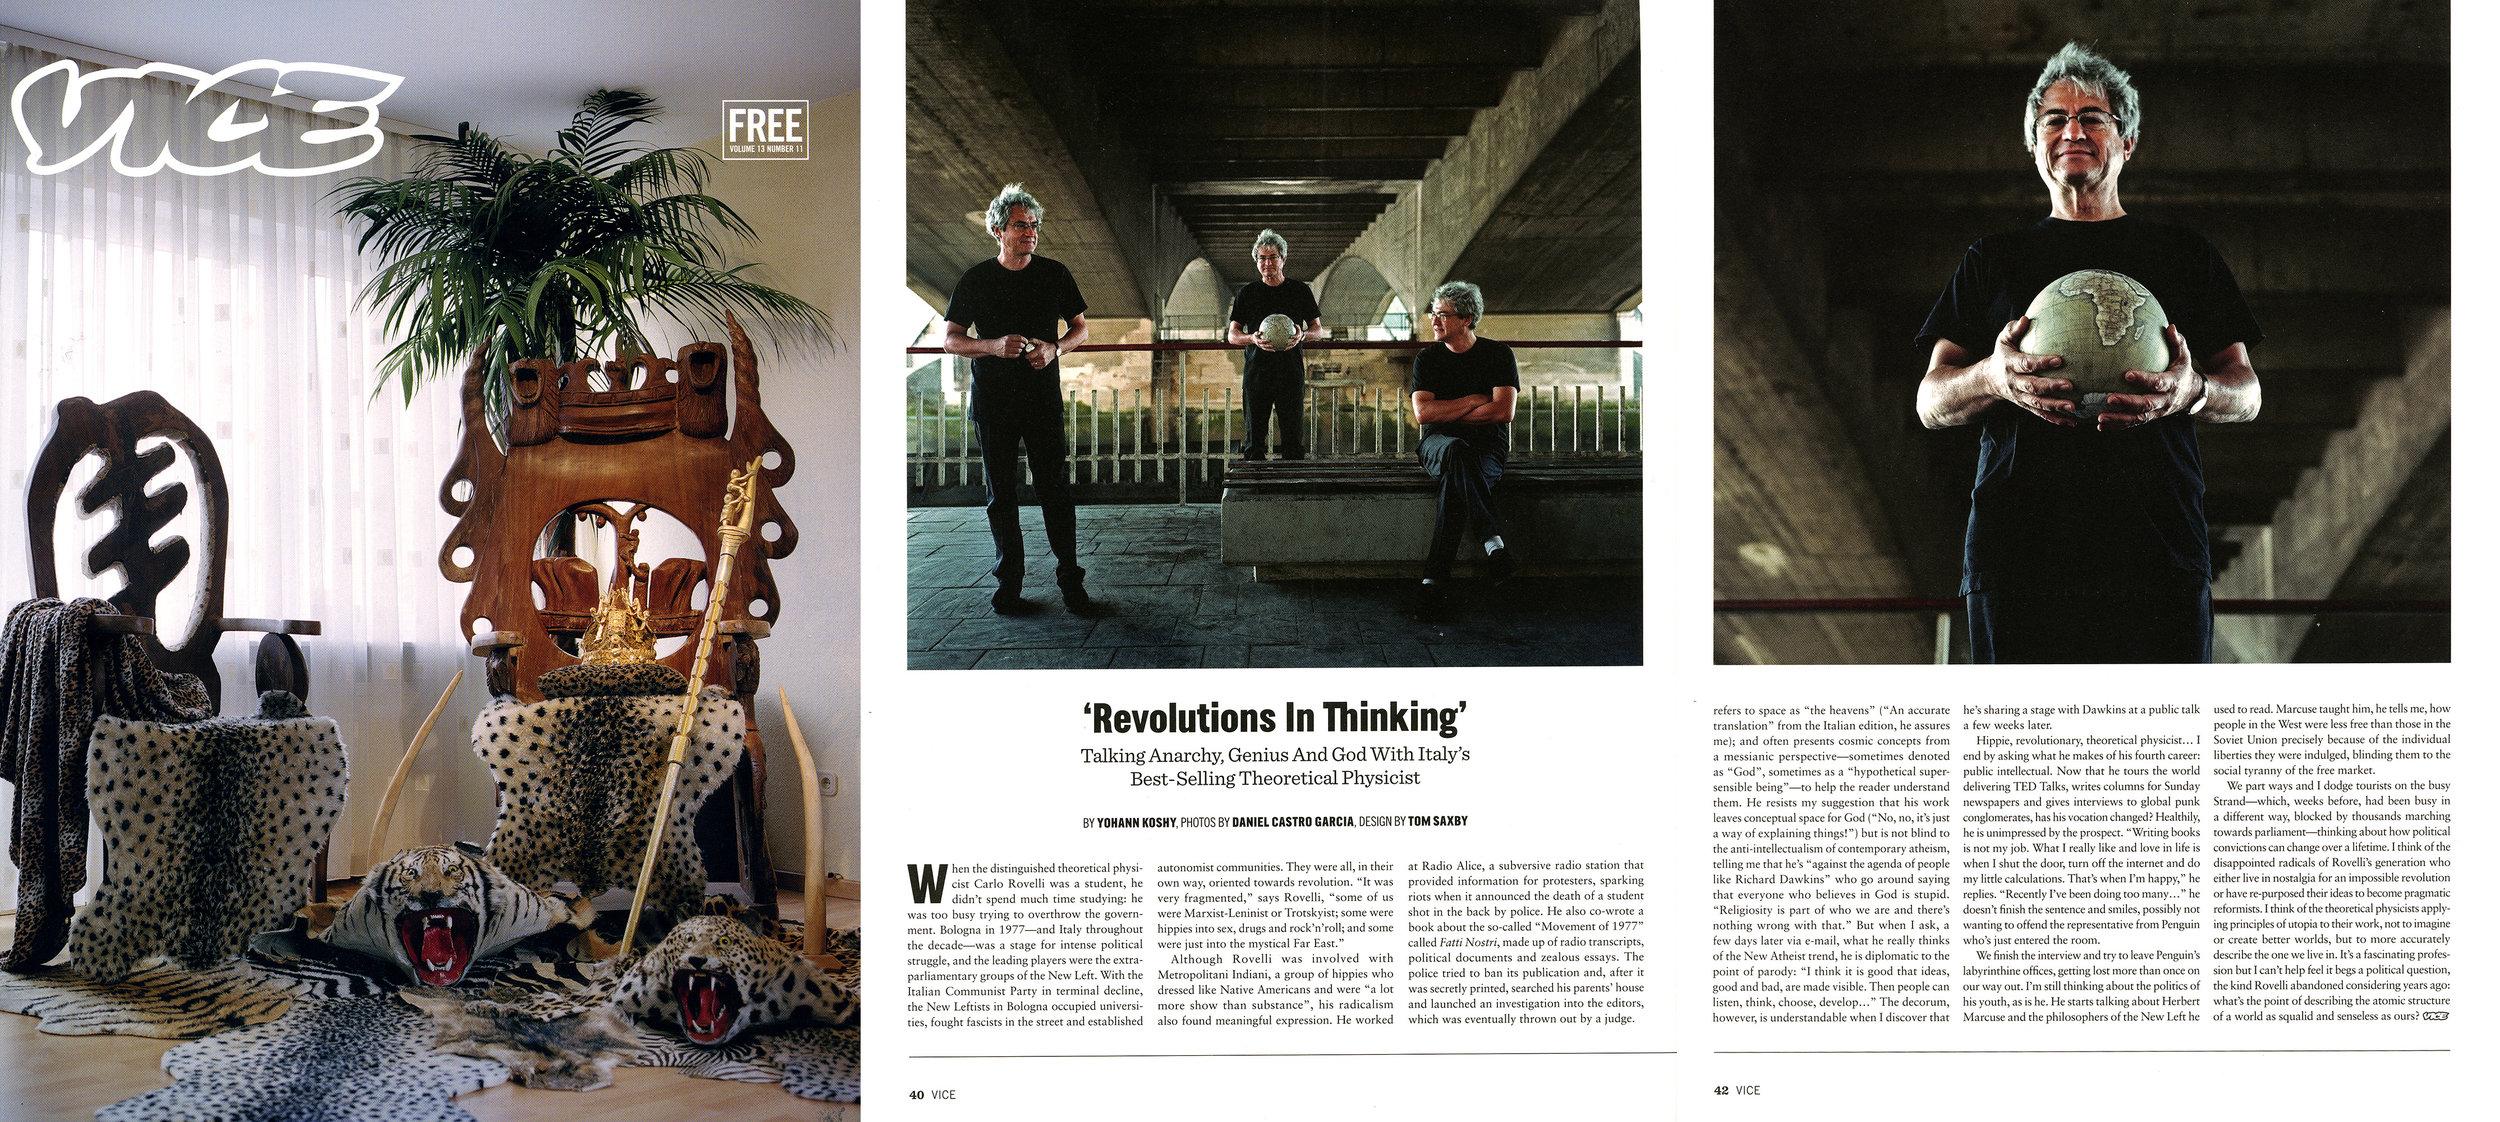 Vice Magazine - Vol. 13 No. 11 - November 2015